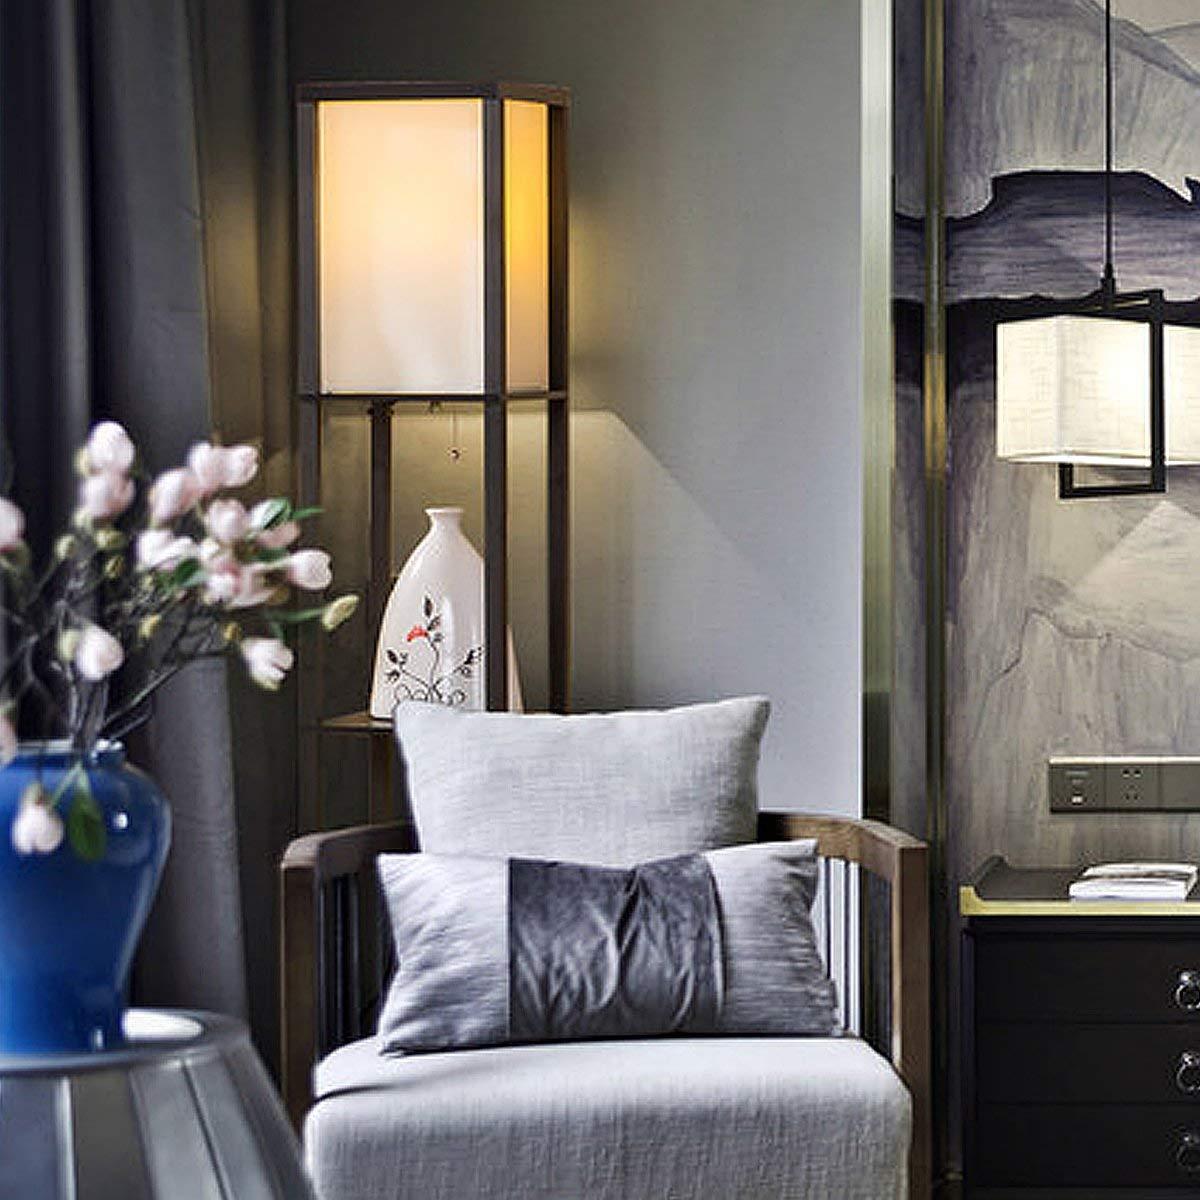 Floor Lamps For Living Room With Shelves Reading Bedroom: Oneach Arterton Modern Shelf Floor Lamp With Open-Box